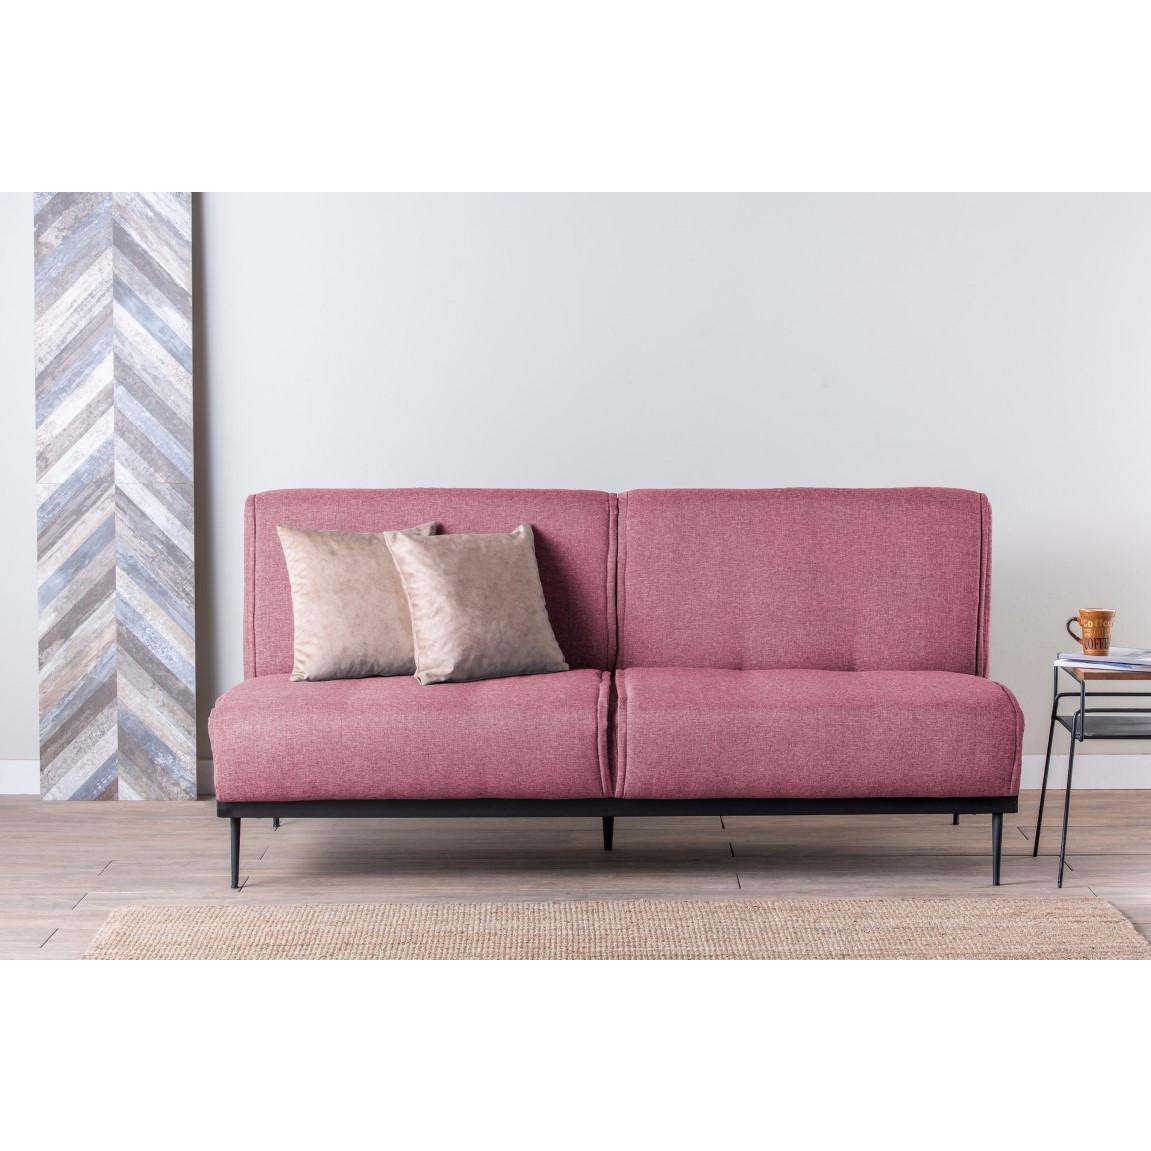 3-Sitzer-Sofabett Anton | Rosa